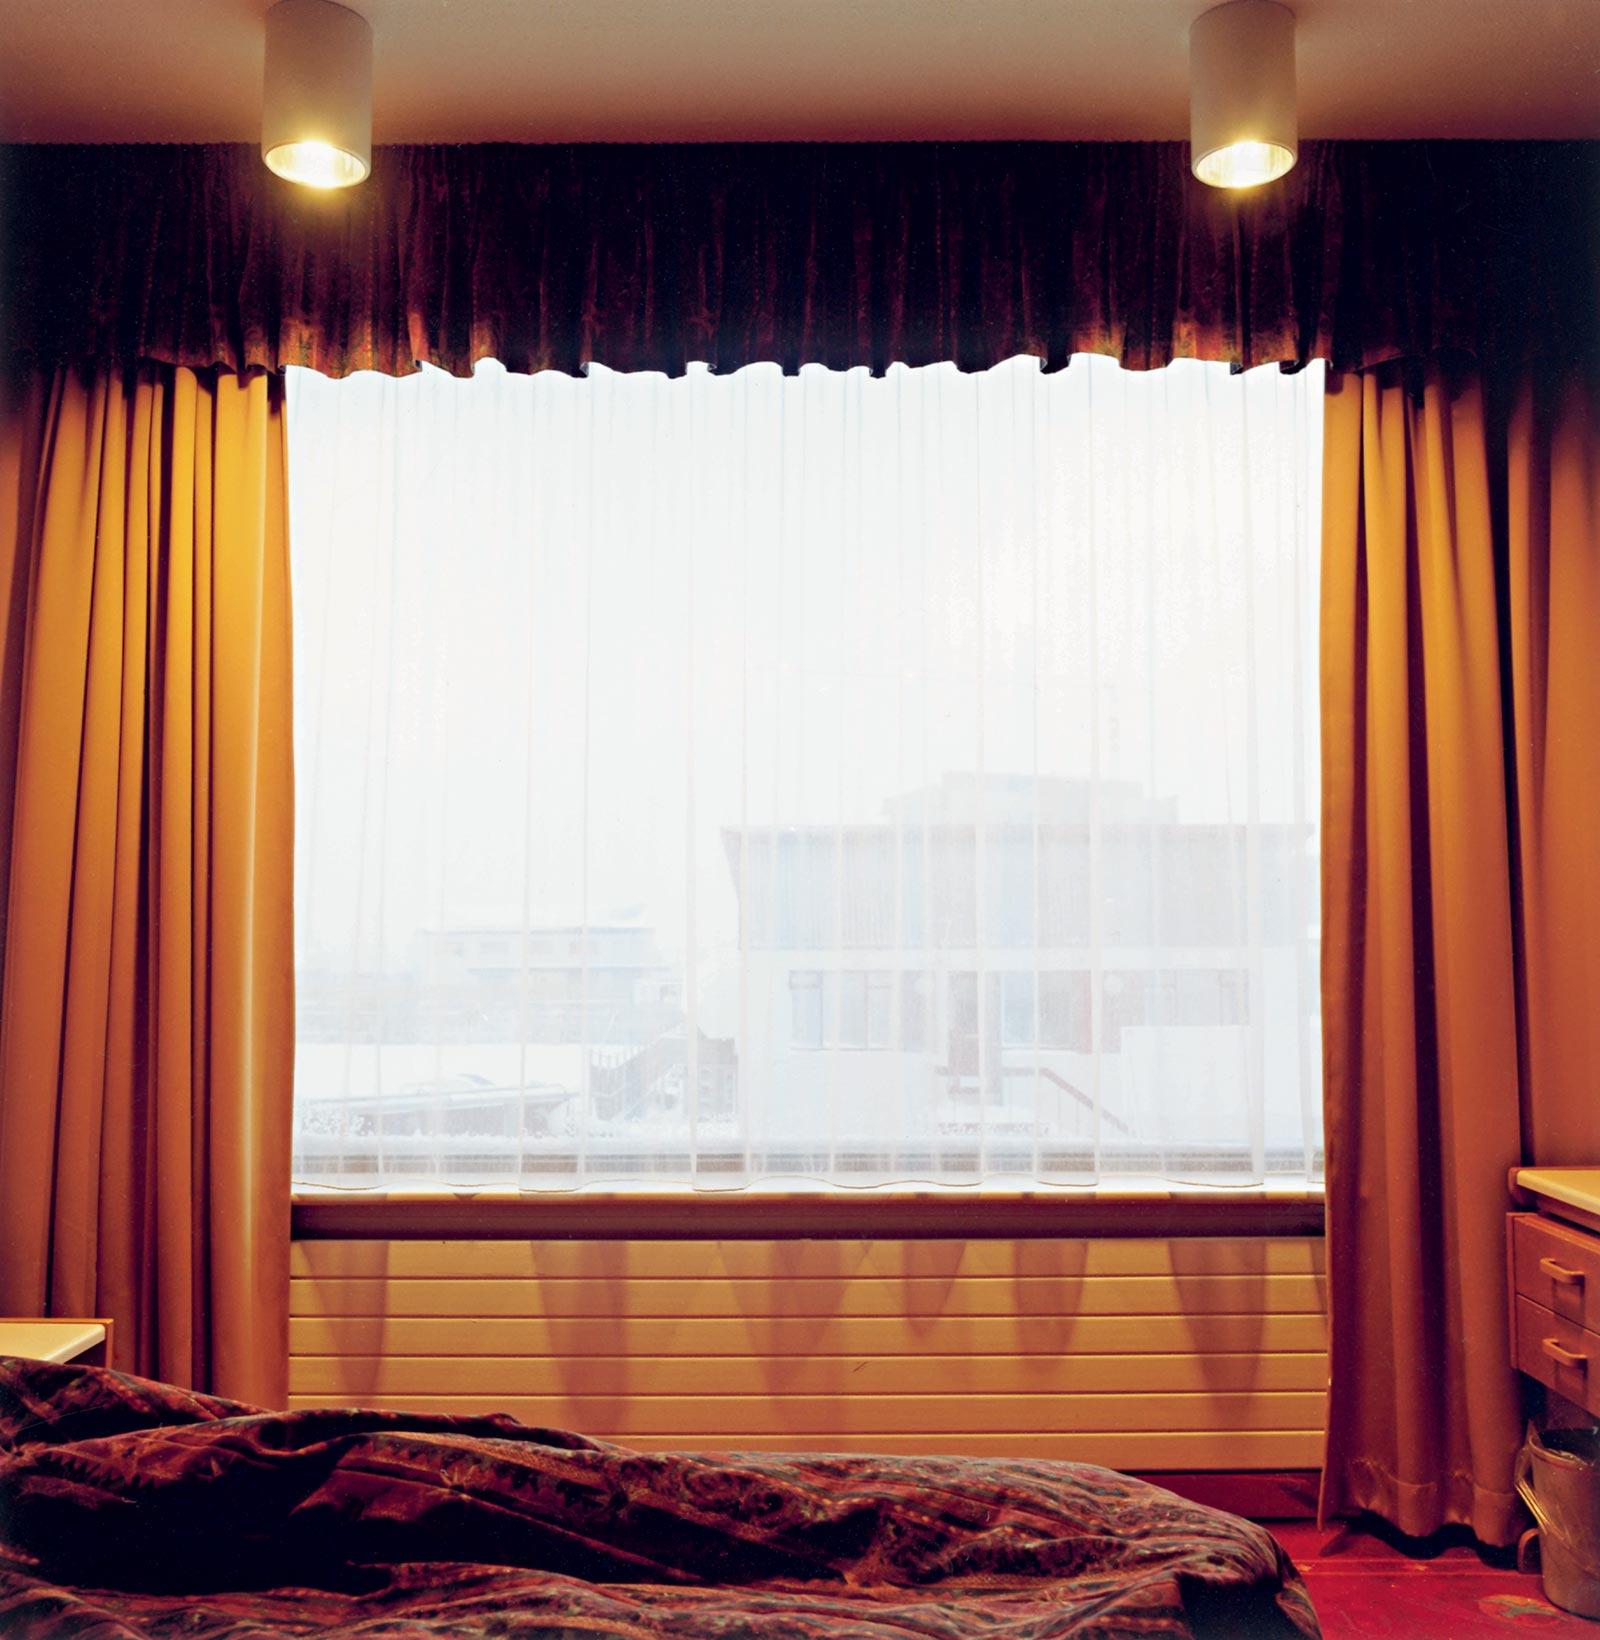 Hotel Keflavik 15:03, 2008, C-print, 65 x 65 cm